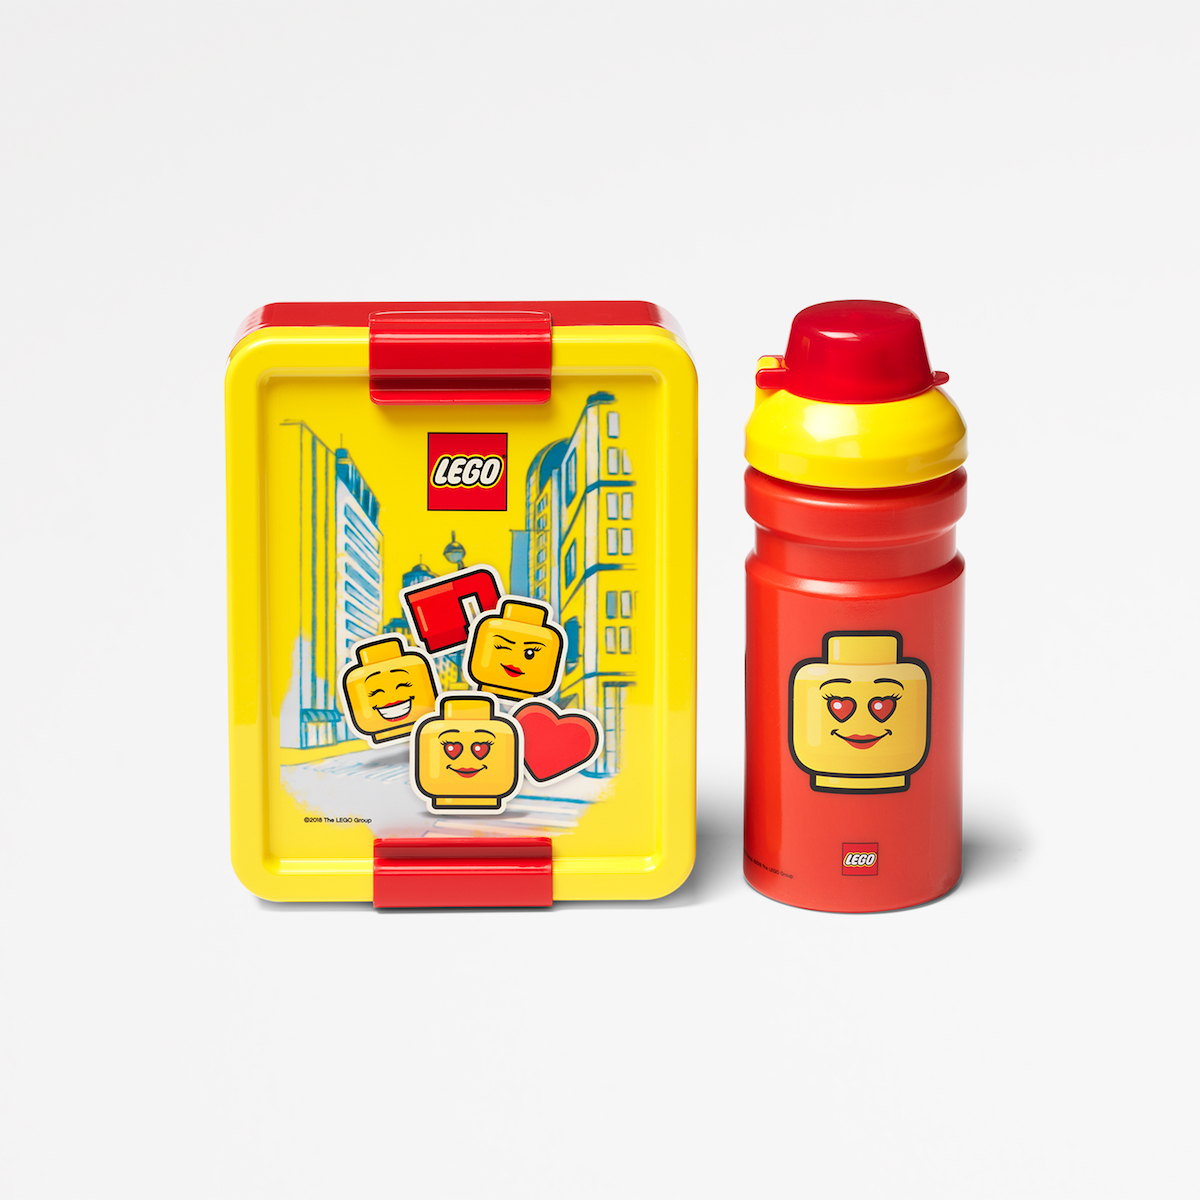 Lego lunch set, lunch, sandwich, nutritious, playful, roomcopenhagen, yellow